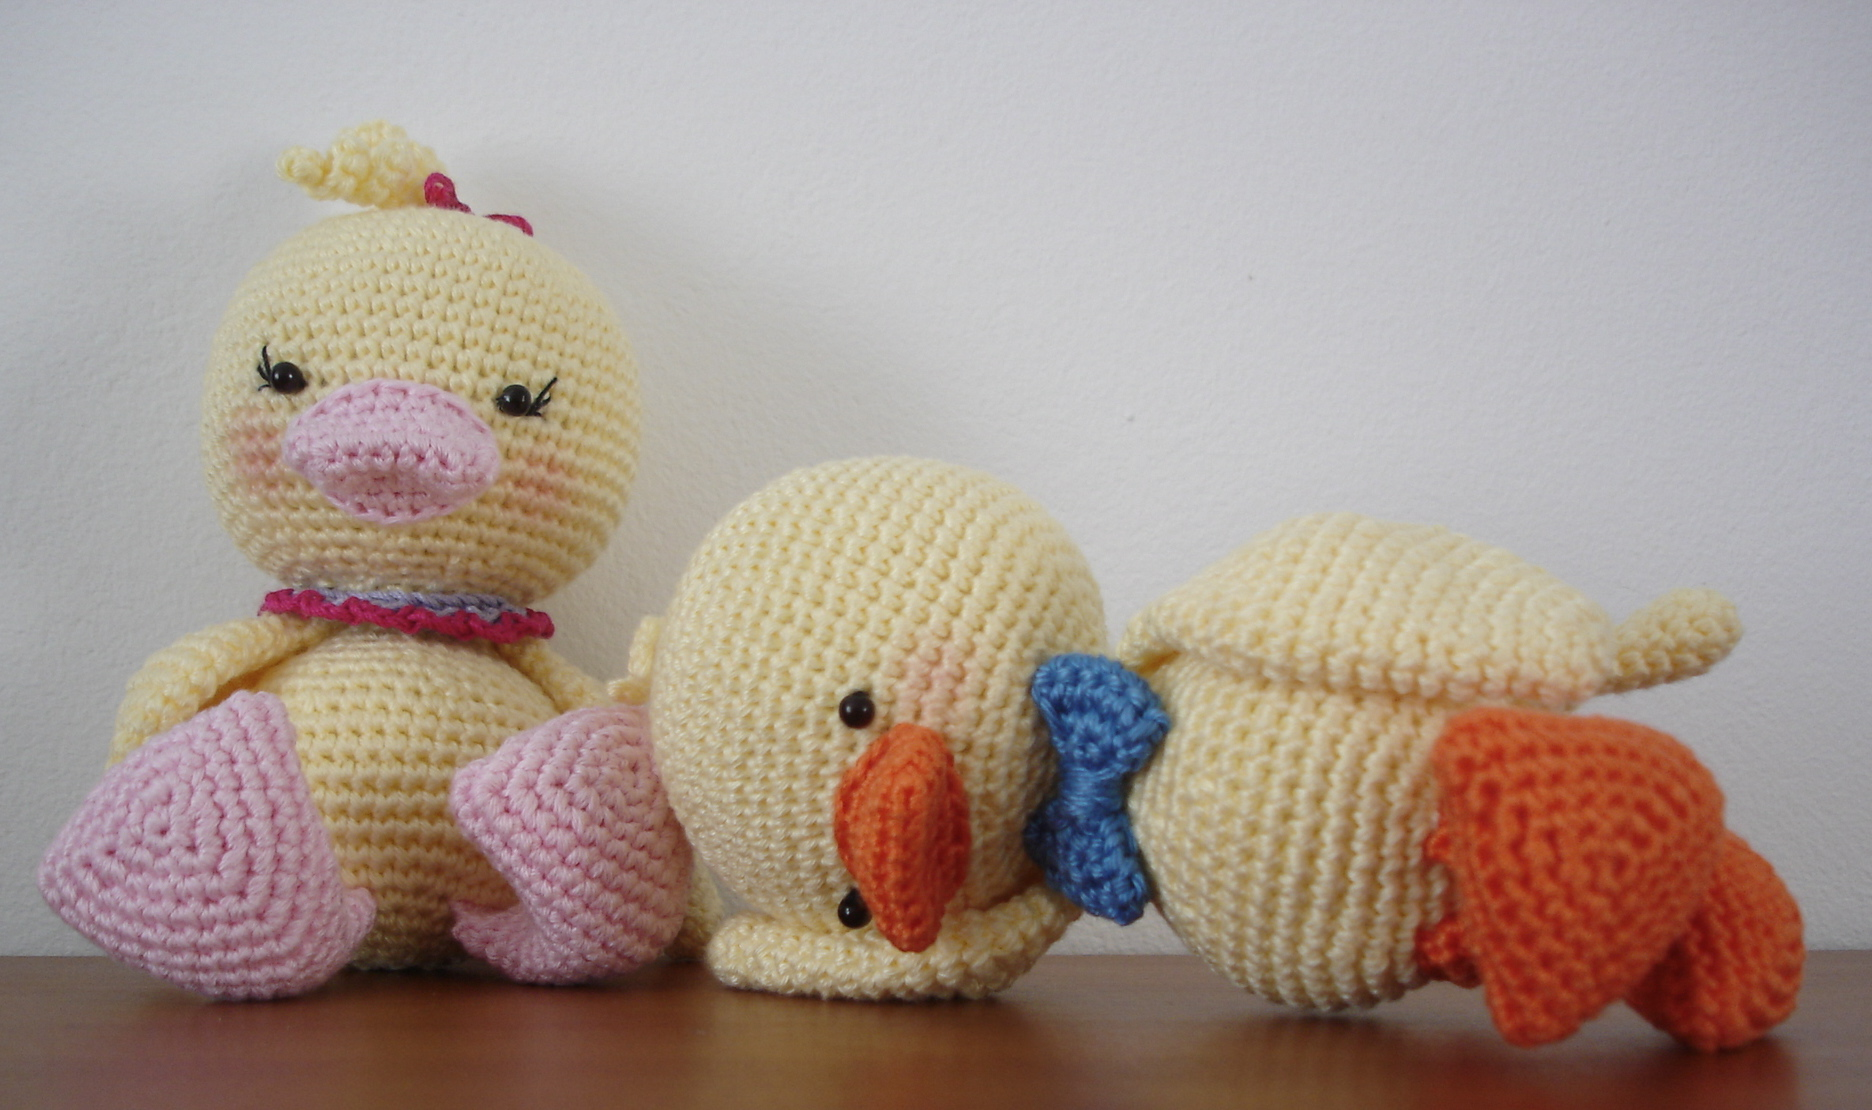 Quack? Quack, quack! AmigurumiBBs Blog